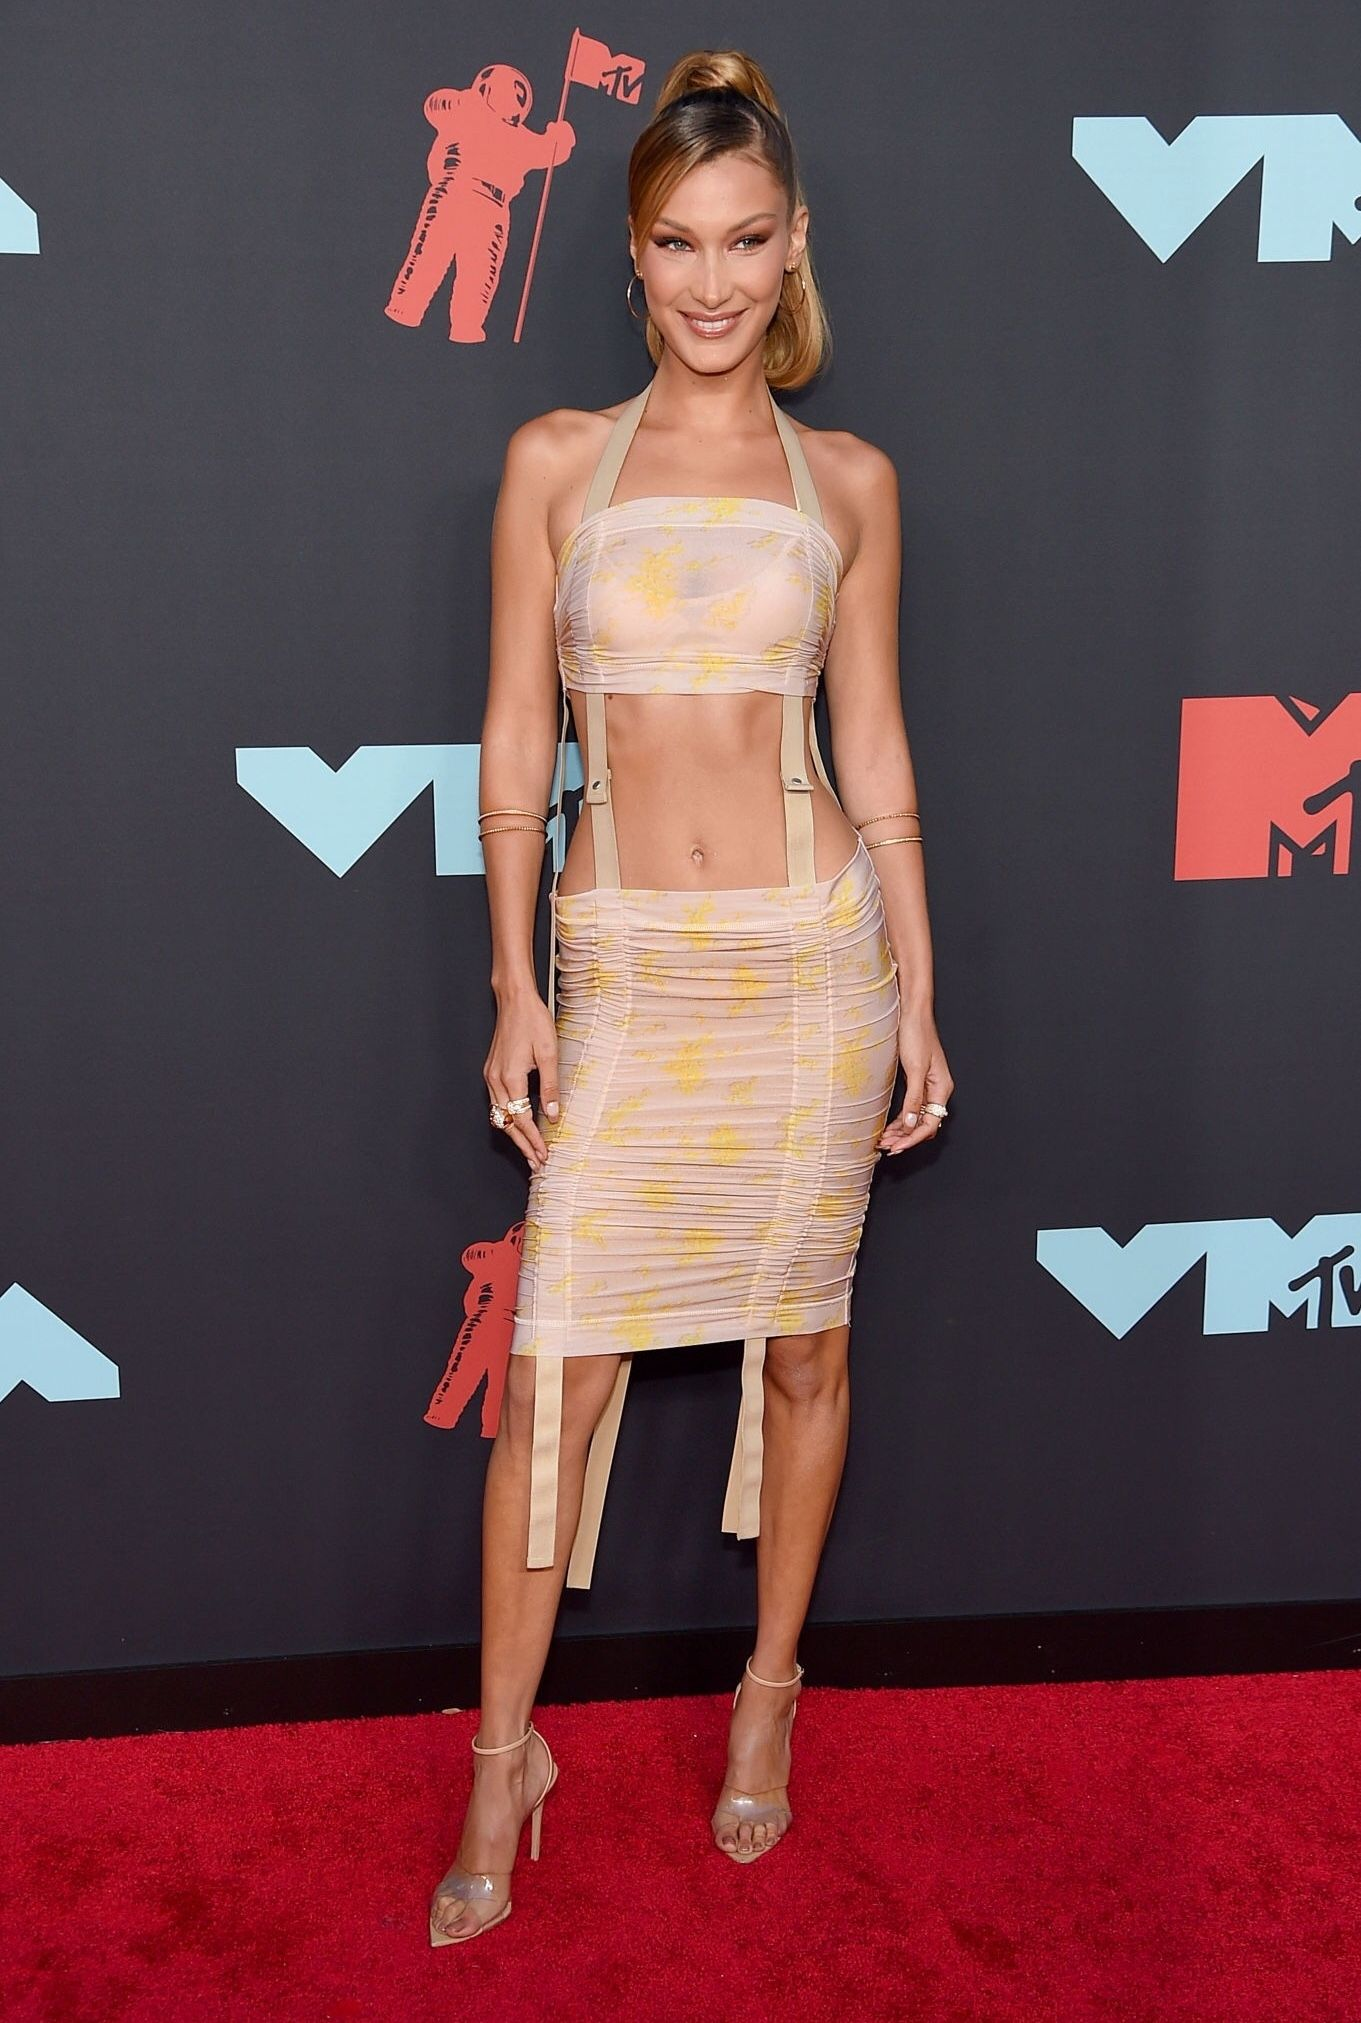 Image result for mtv music awards red carpet 2019